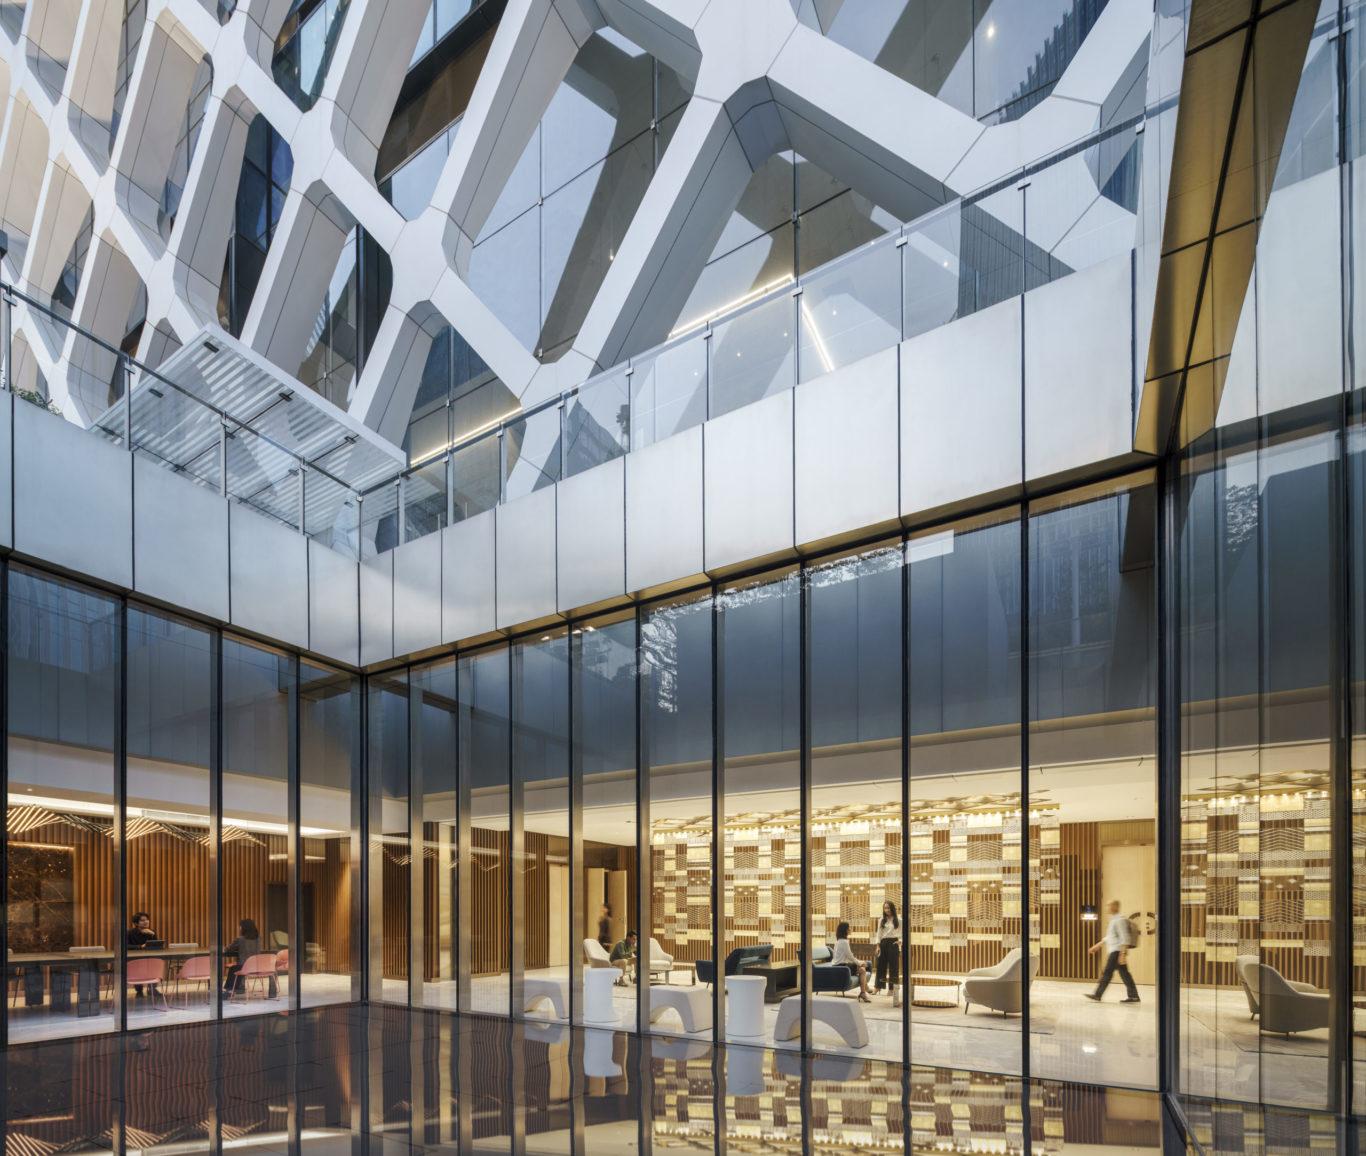 Slide 7 of 10, Shenzhen Rural Bank Headquarters